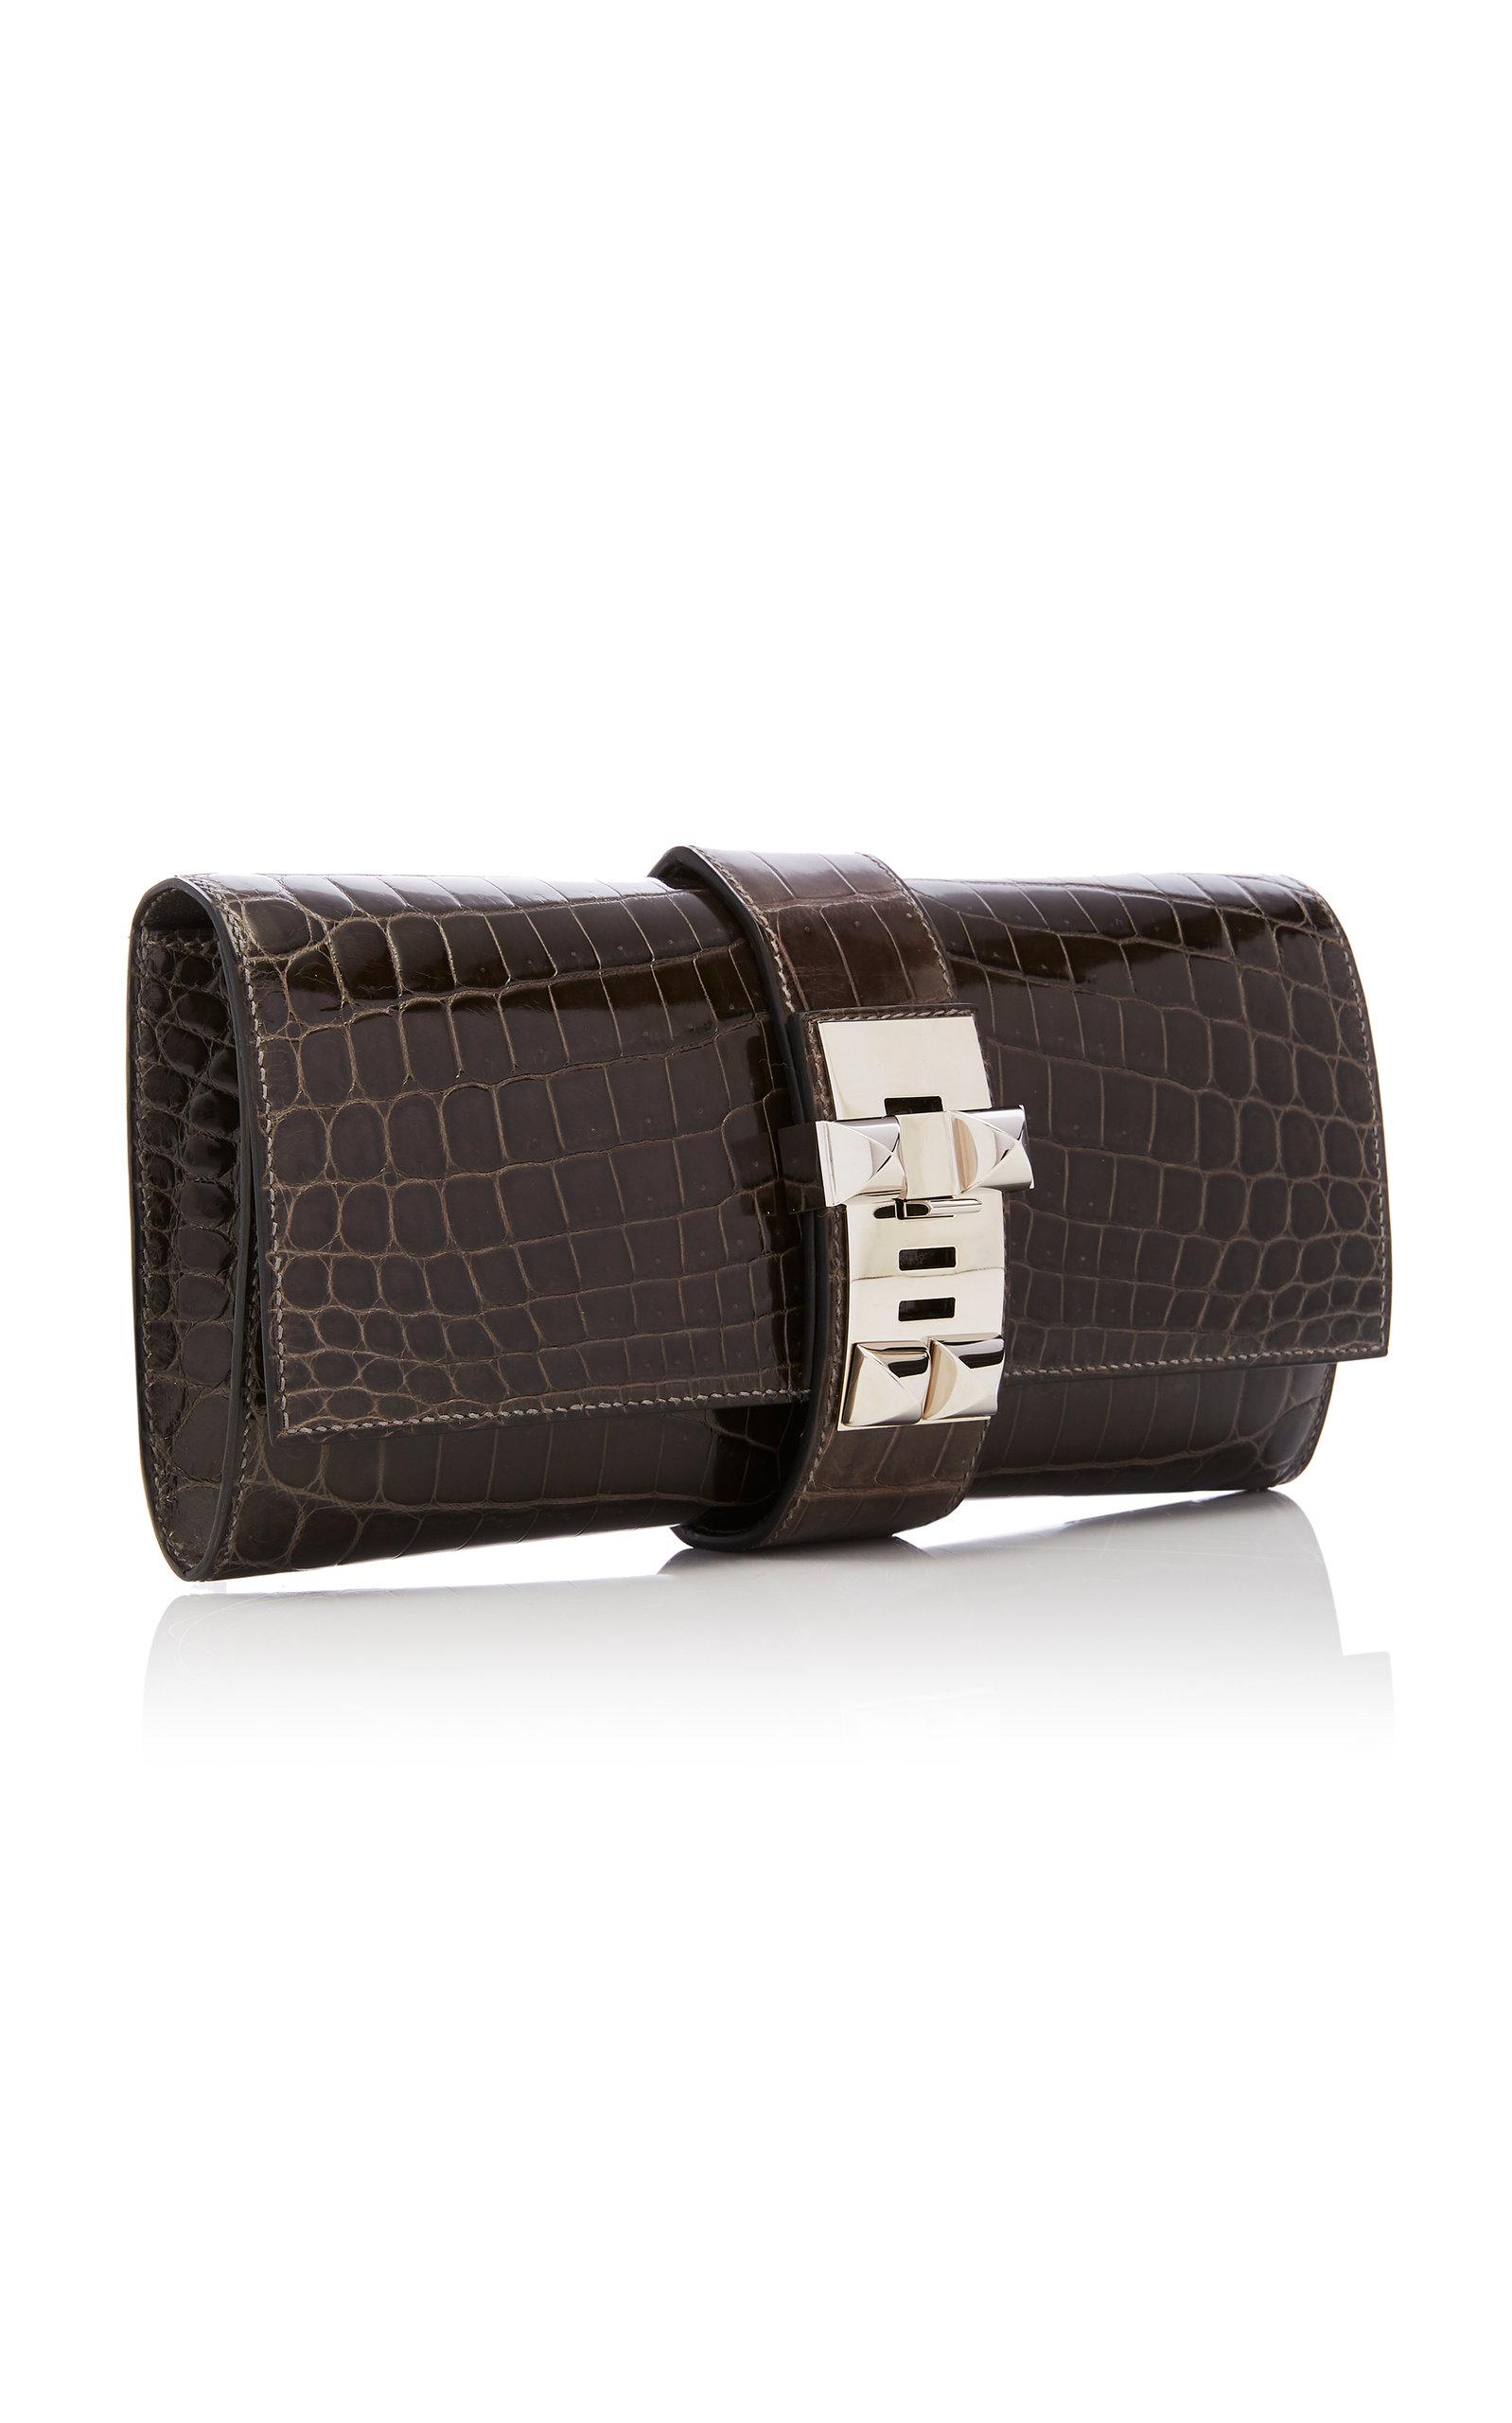 c1768999997 Hermès Shiny Graphire Niloticus Crocodile Medor Clutch by Hermès ...